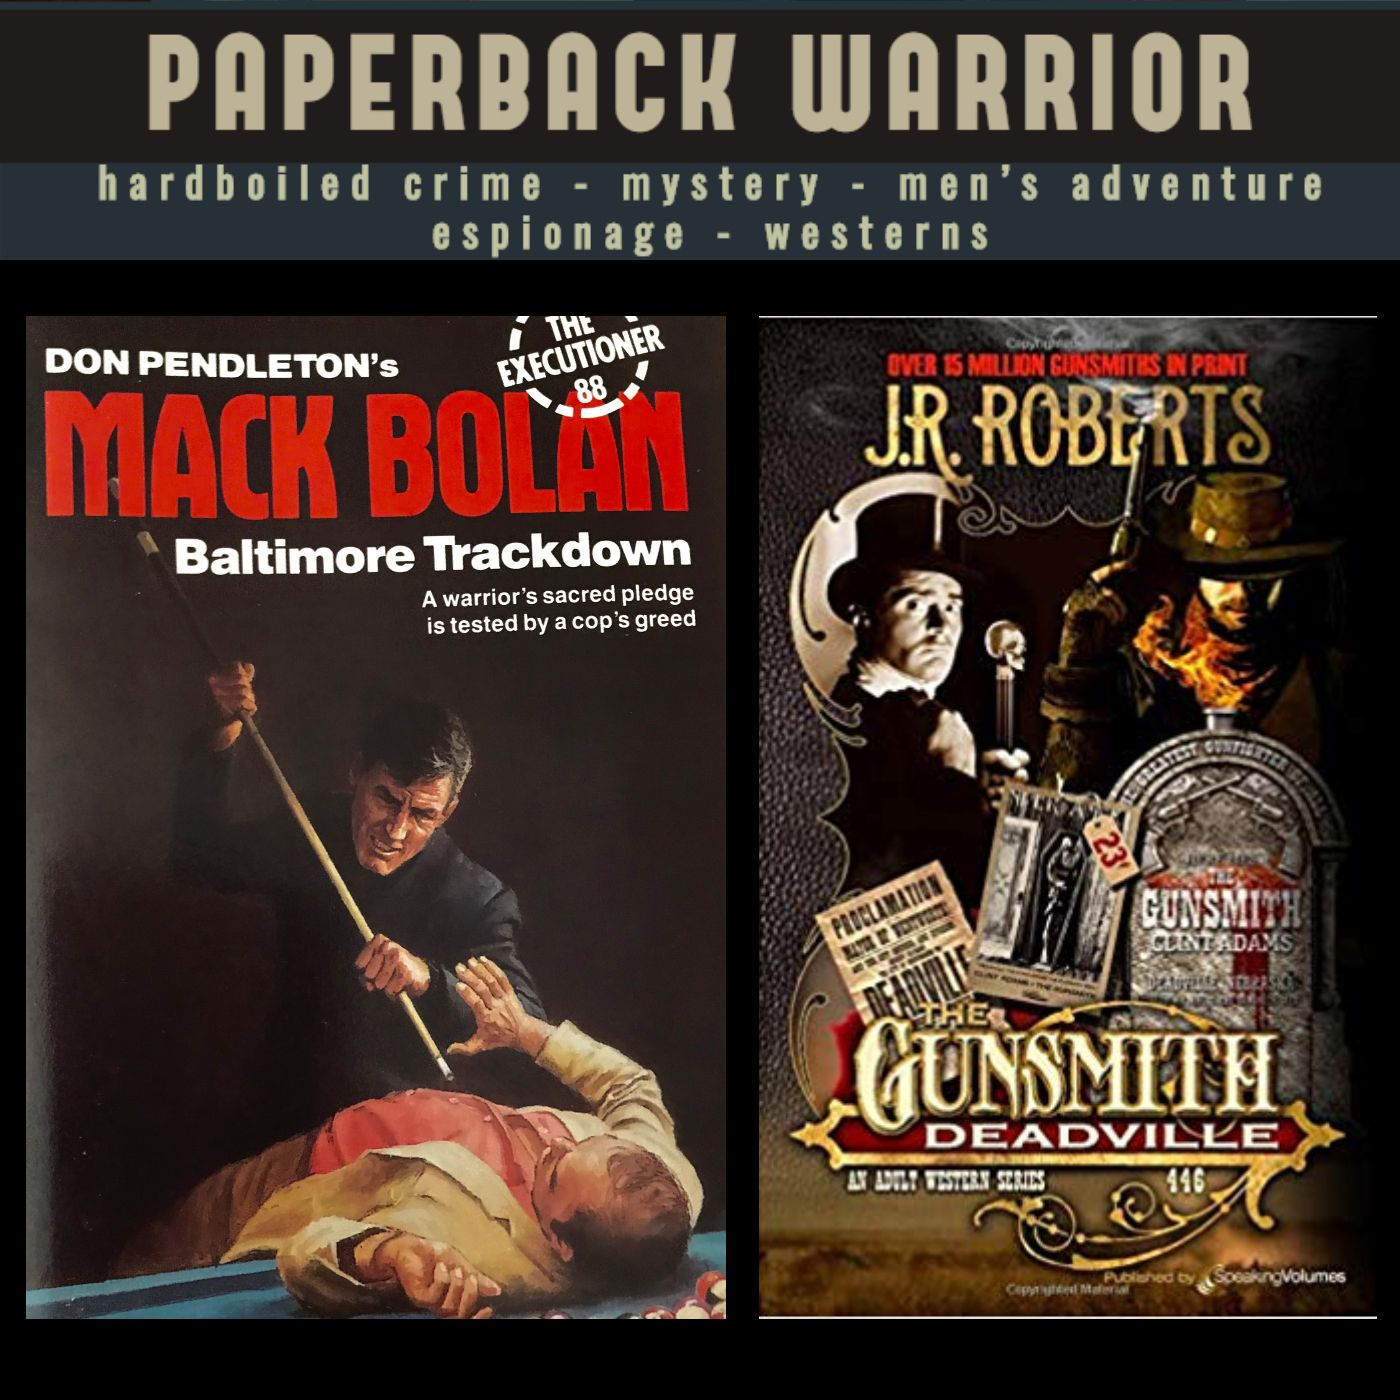 Episode 05: The Executioner Mack Bolan